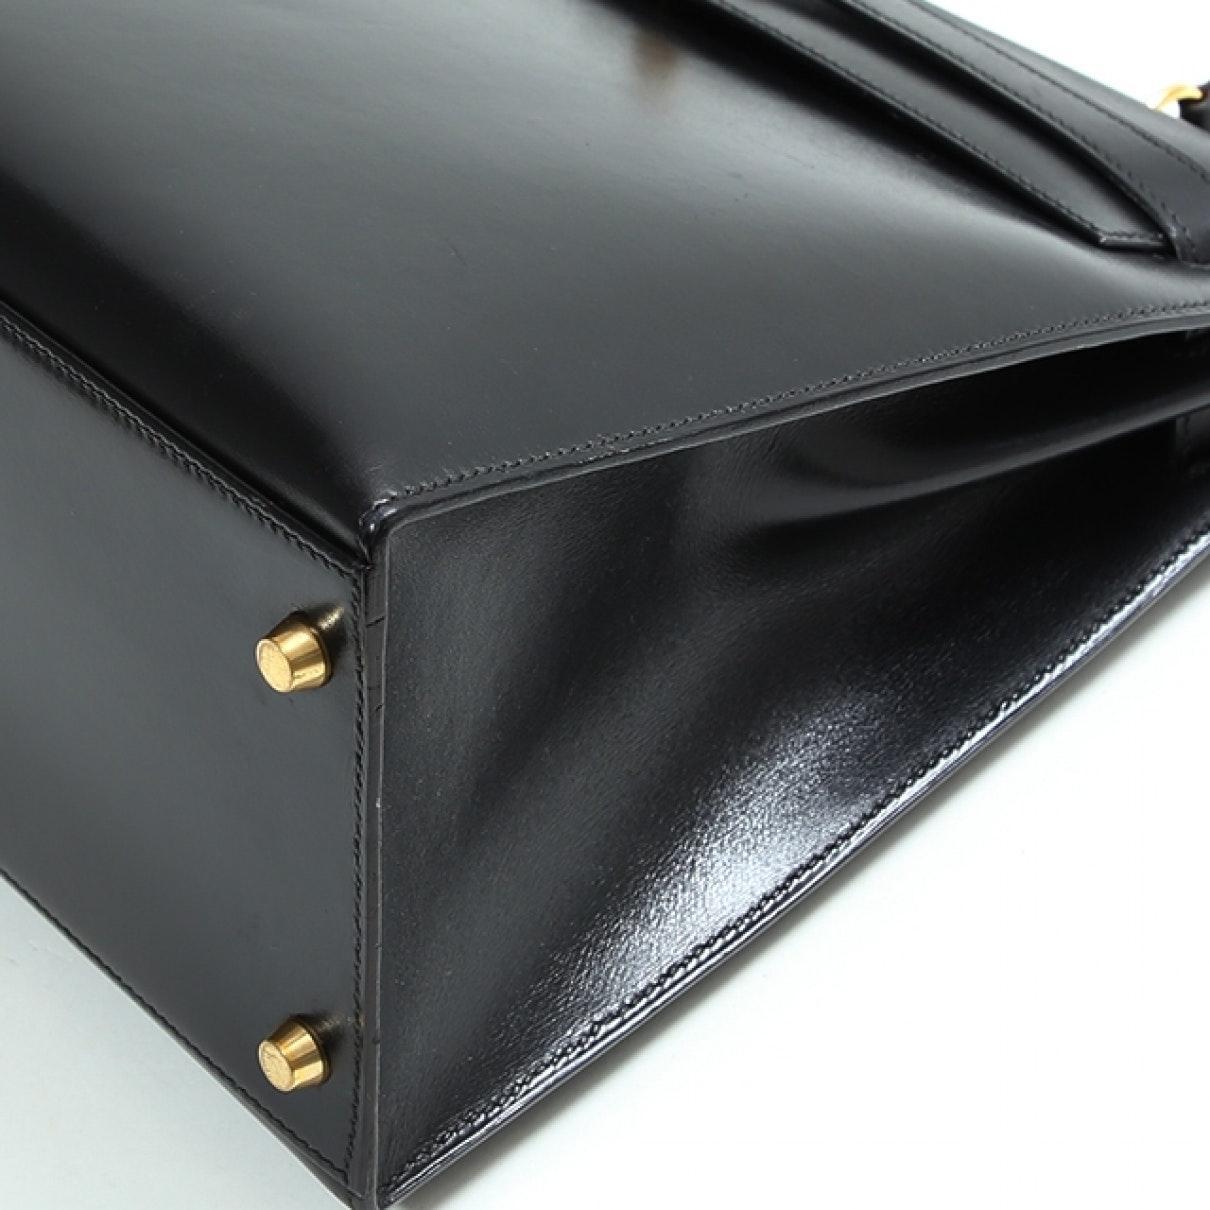 Sac à main Kelly 35 en Cuir Noir Cuir Hermès en coloris Noir xcdv